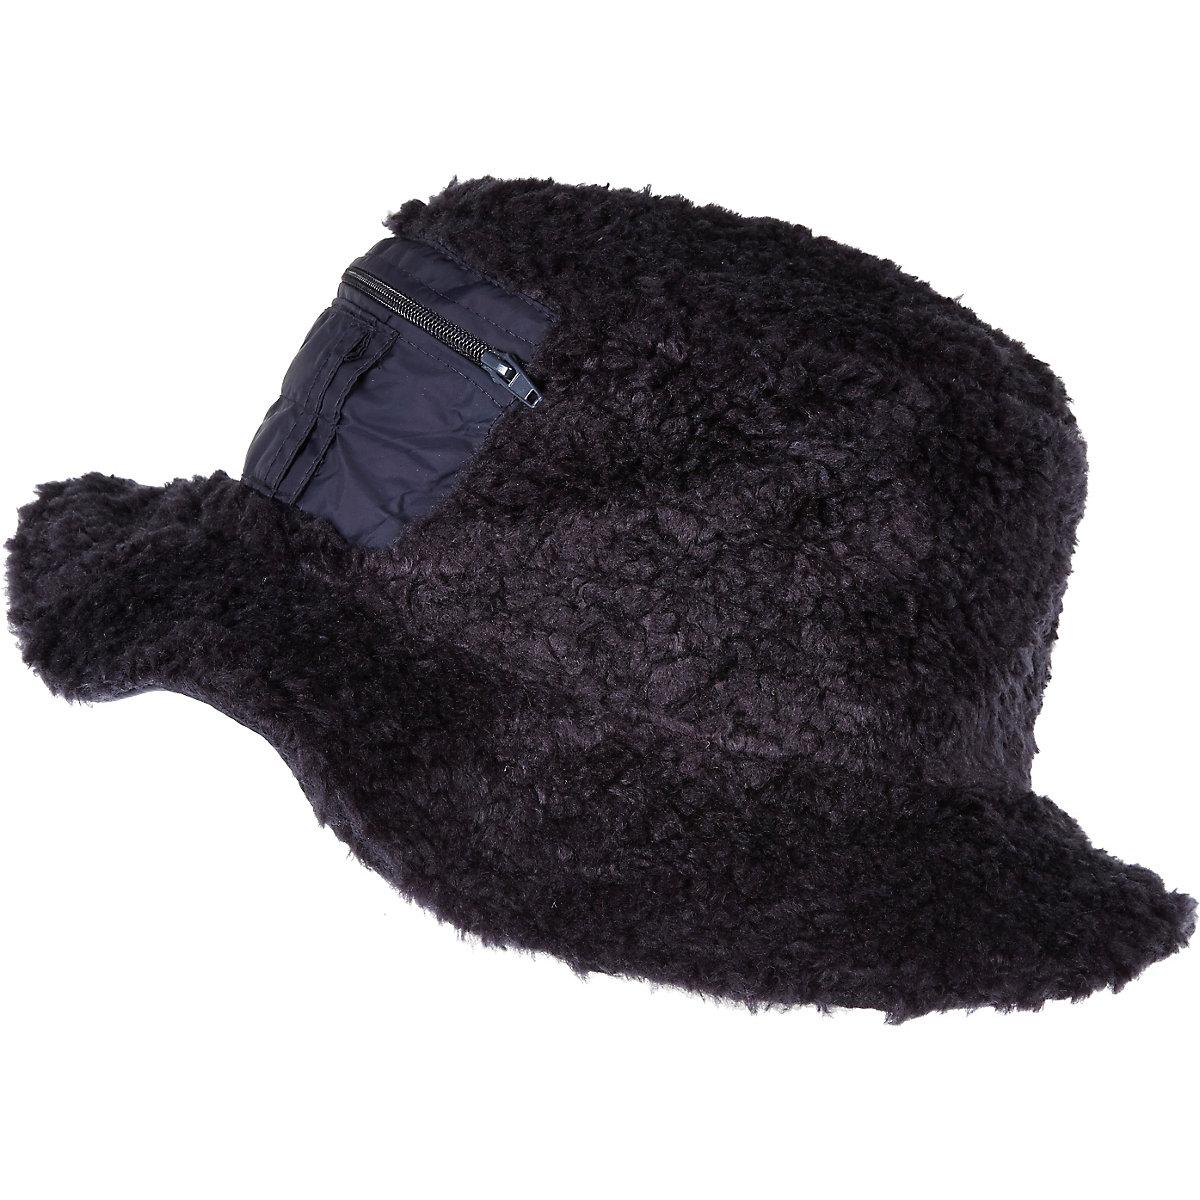 Navy Christopher Shannon faux fur bucket hat